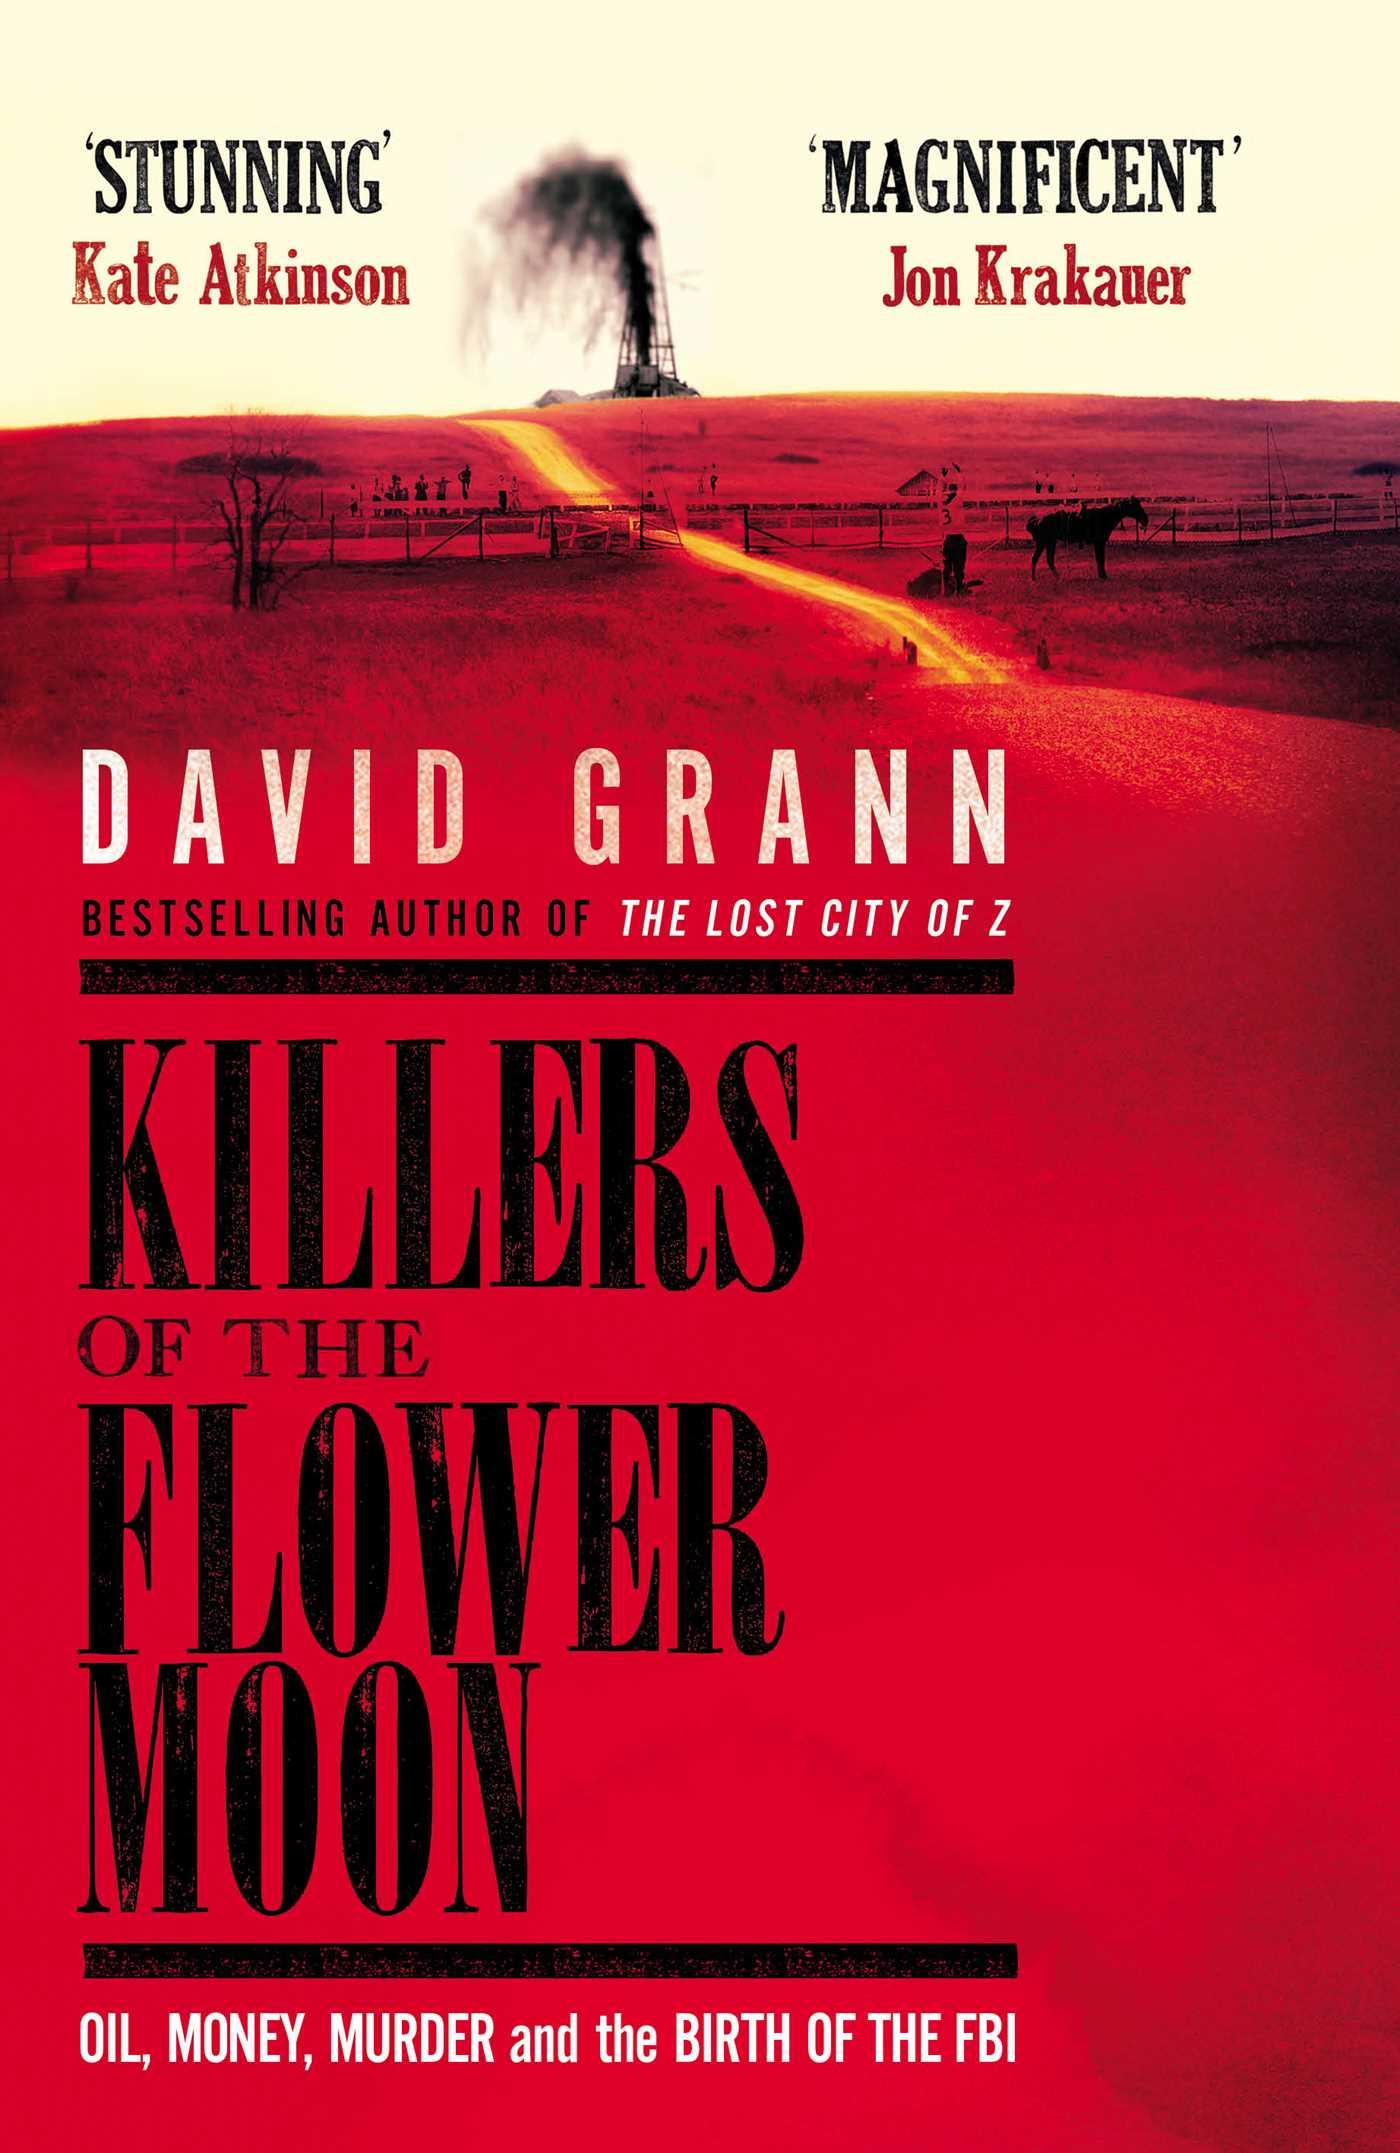 Killers of the flower moon 9781471140266 hr